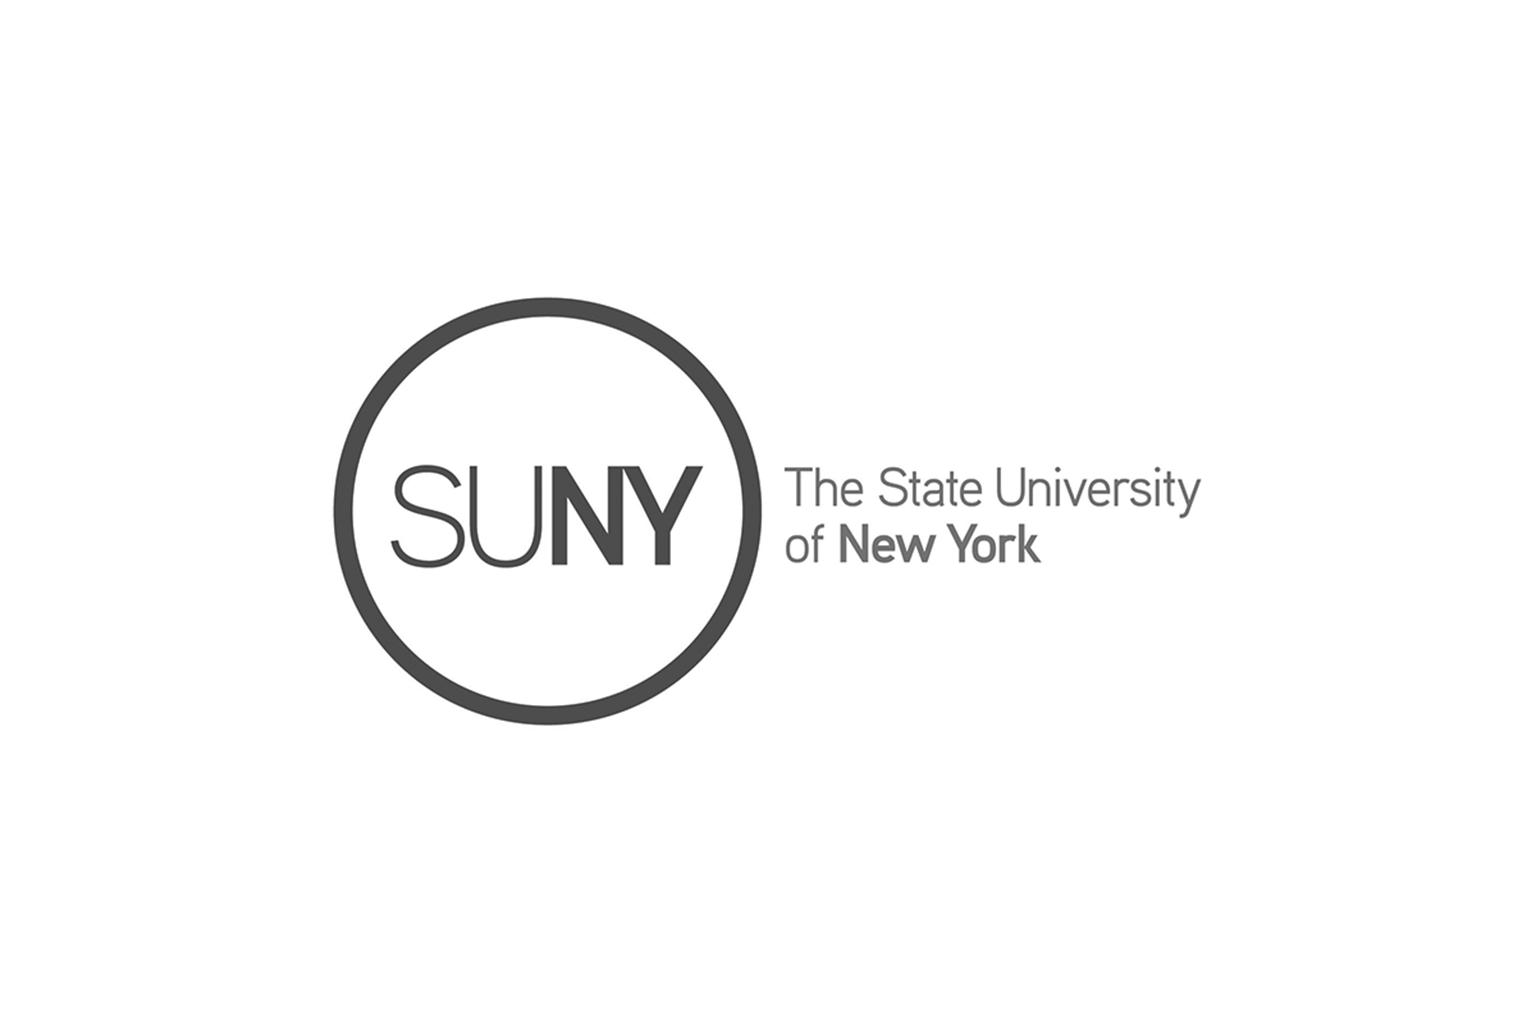 suny-newpaltz-logo.png